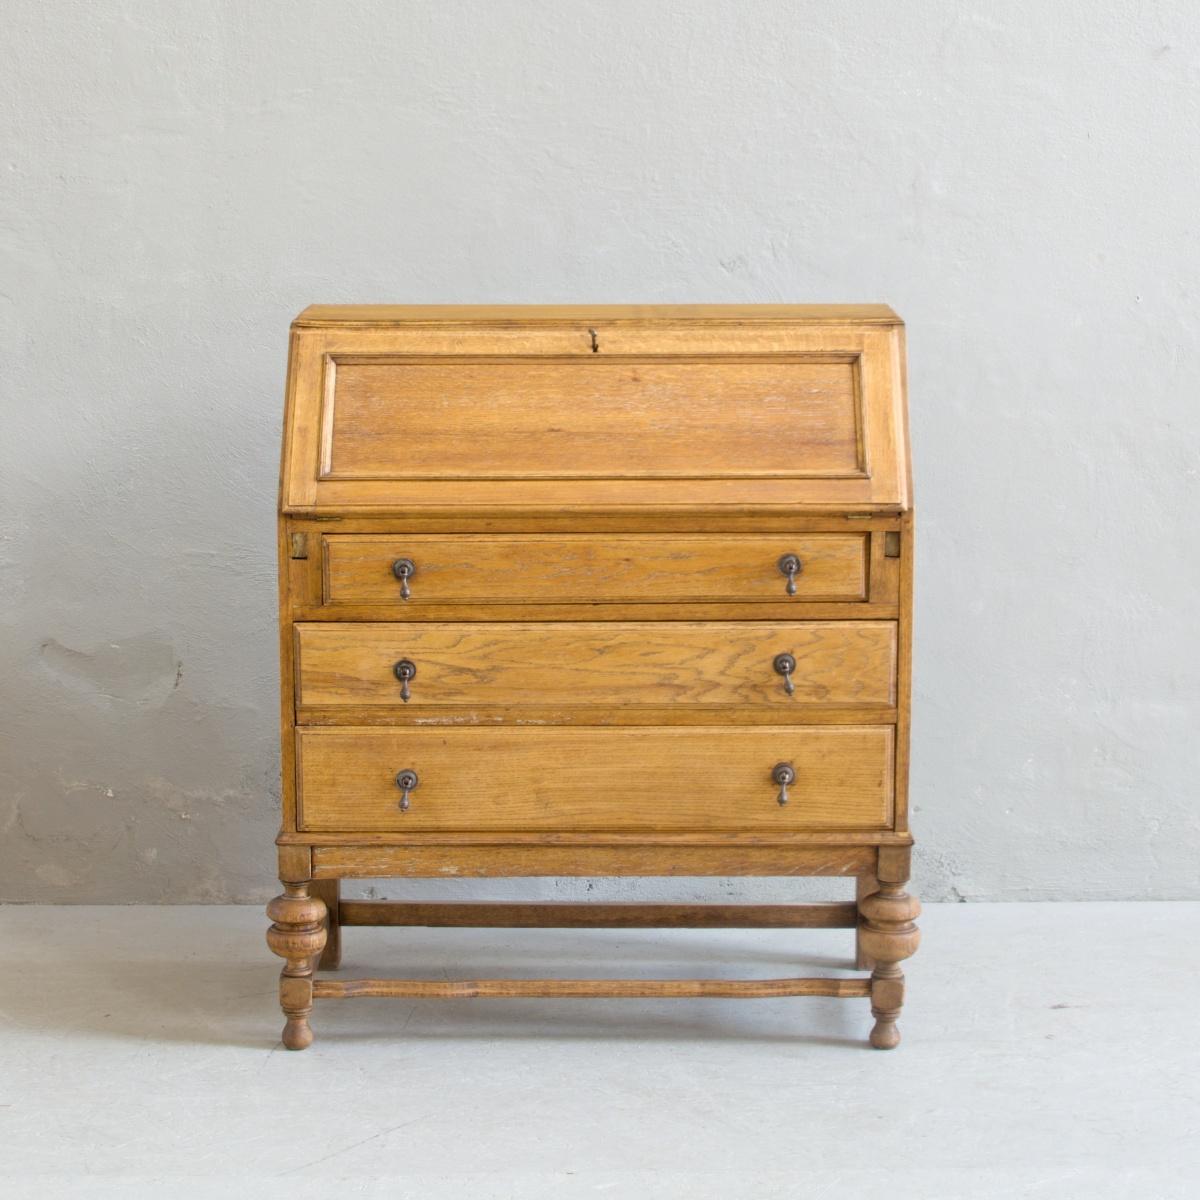 Prodej anglického nábytku anglický sekretář